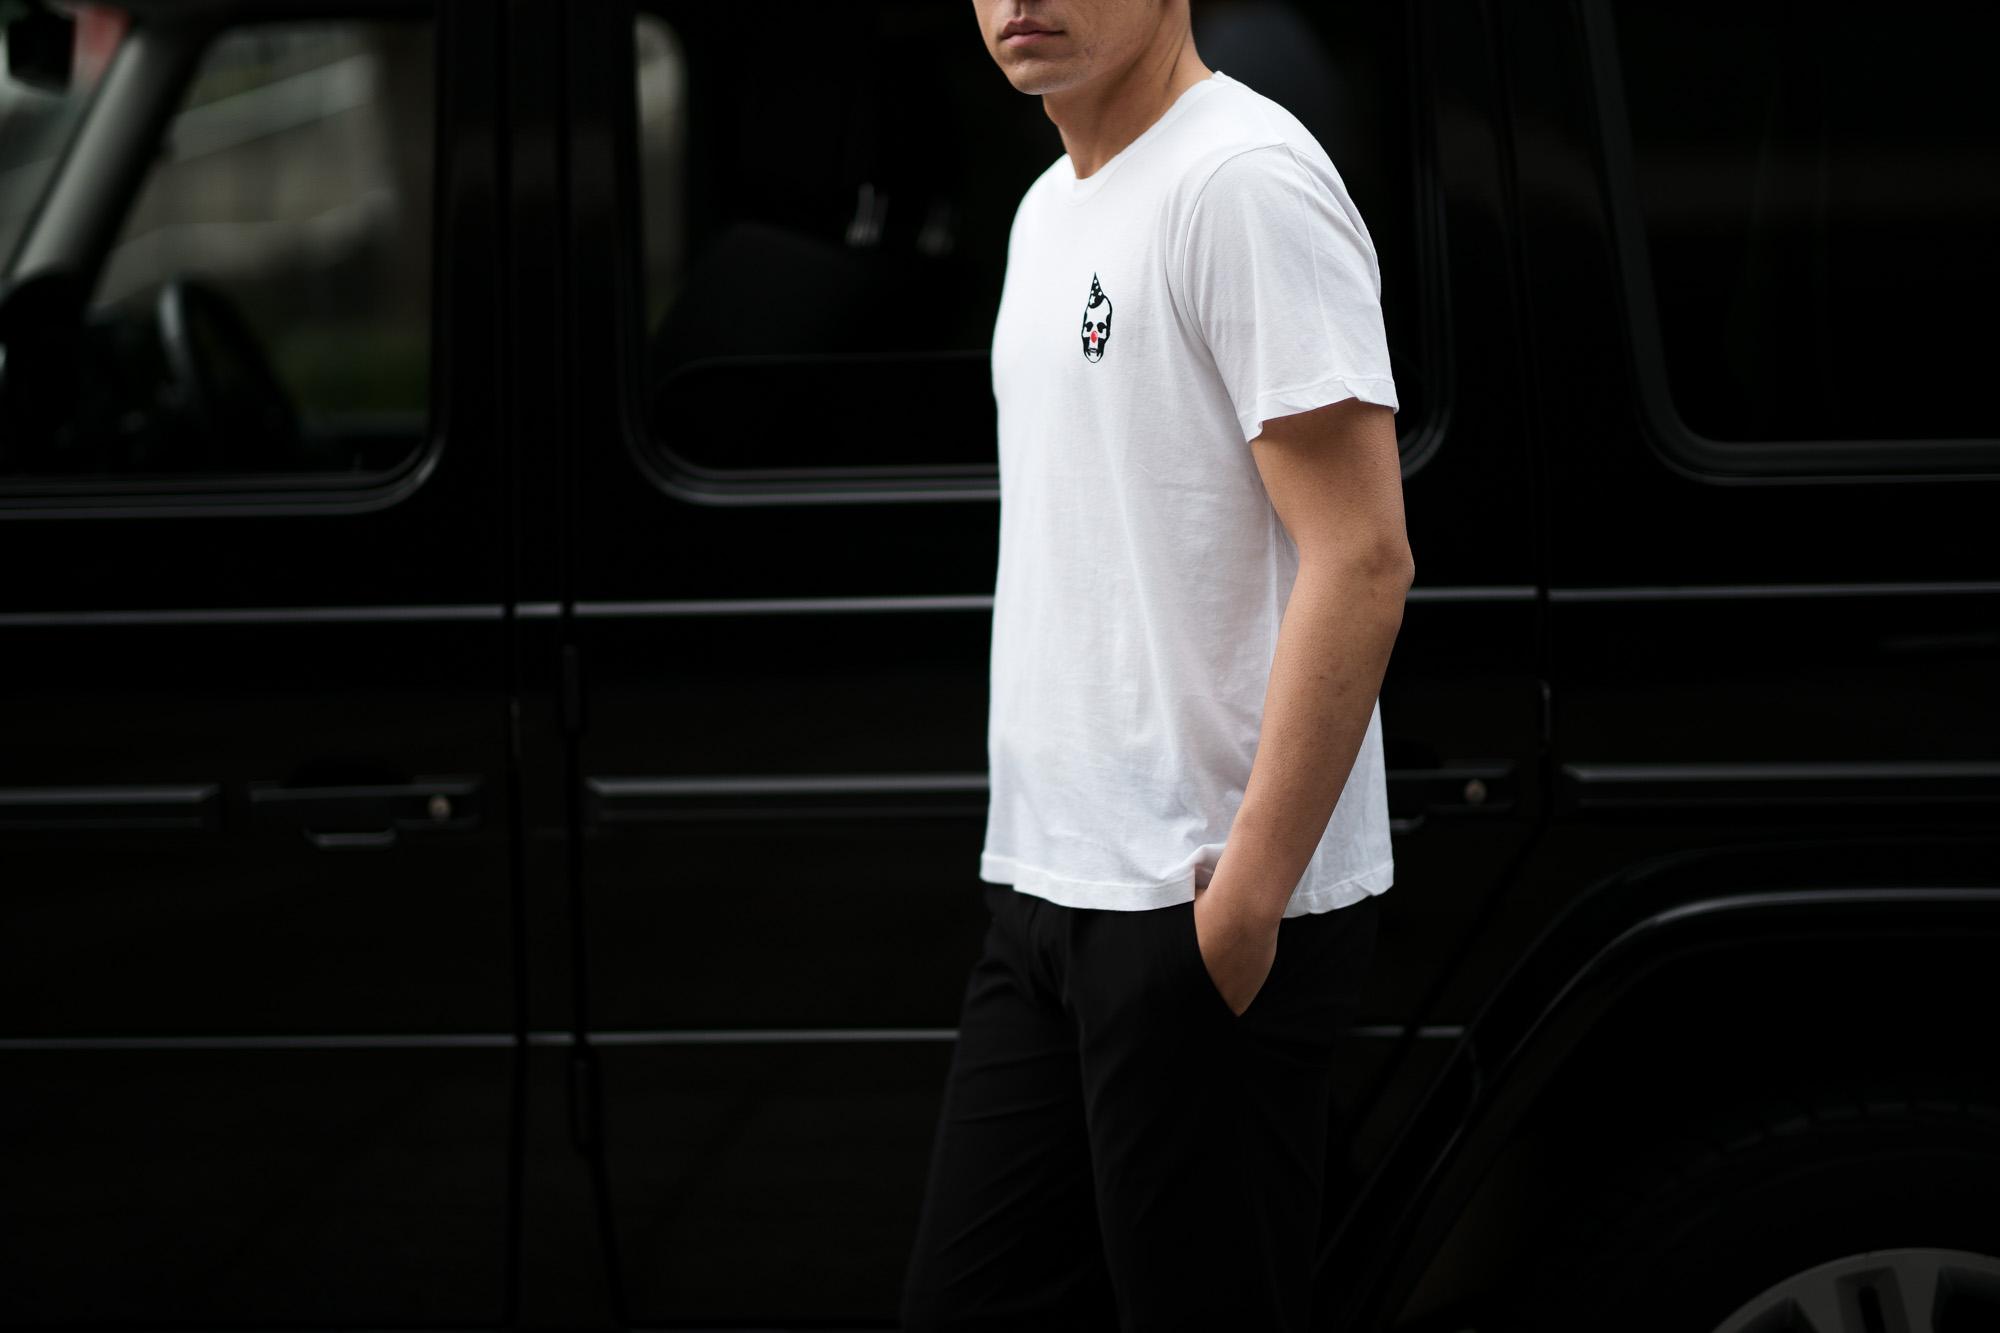 lucien pellat-finet (ルシアン ペラフィネ) 2 Pack Skull Print T-Shirt スカルプリント 2パック Tシャツ BLACK / WHITE (ブラック / ホワイト) (2枚セット) 2019 春夏新作 lucienpellatfinet 愛知 名古屋 altoediritto アルトエデリット